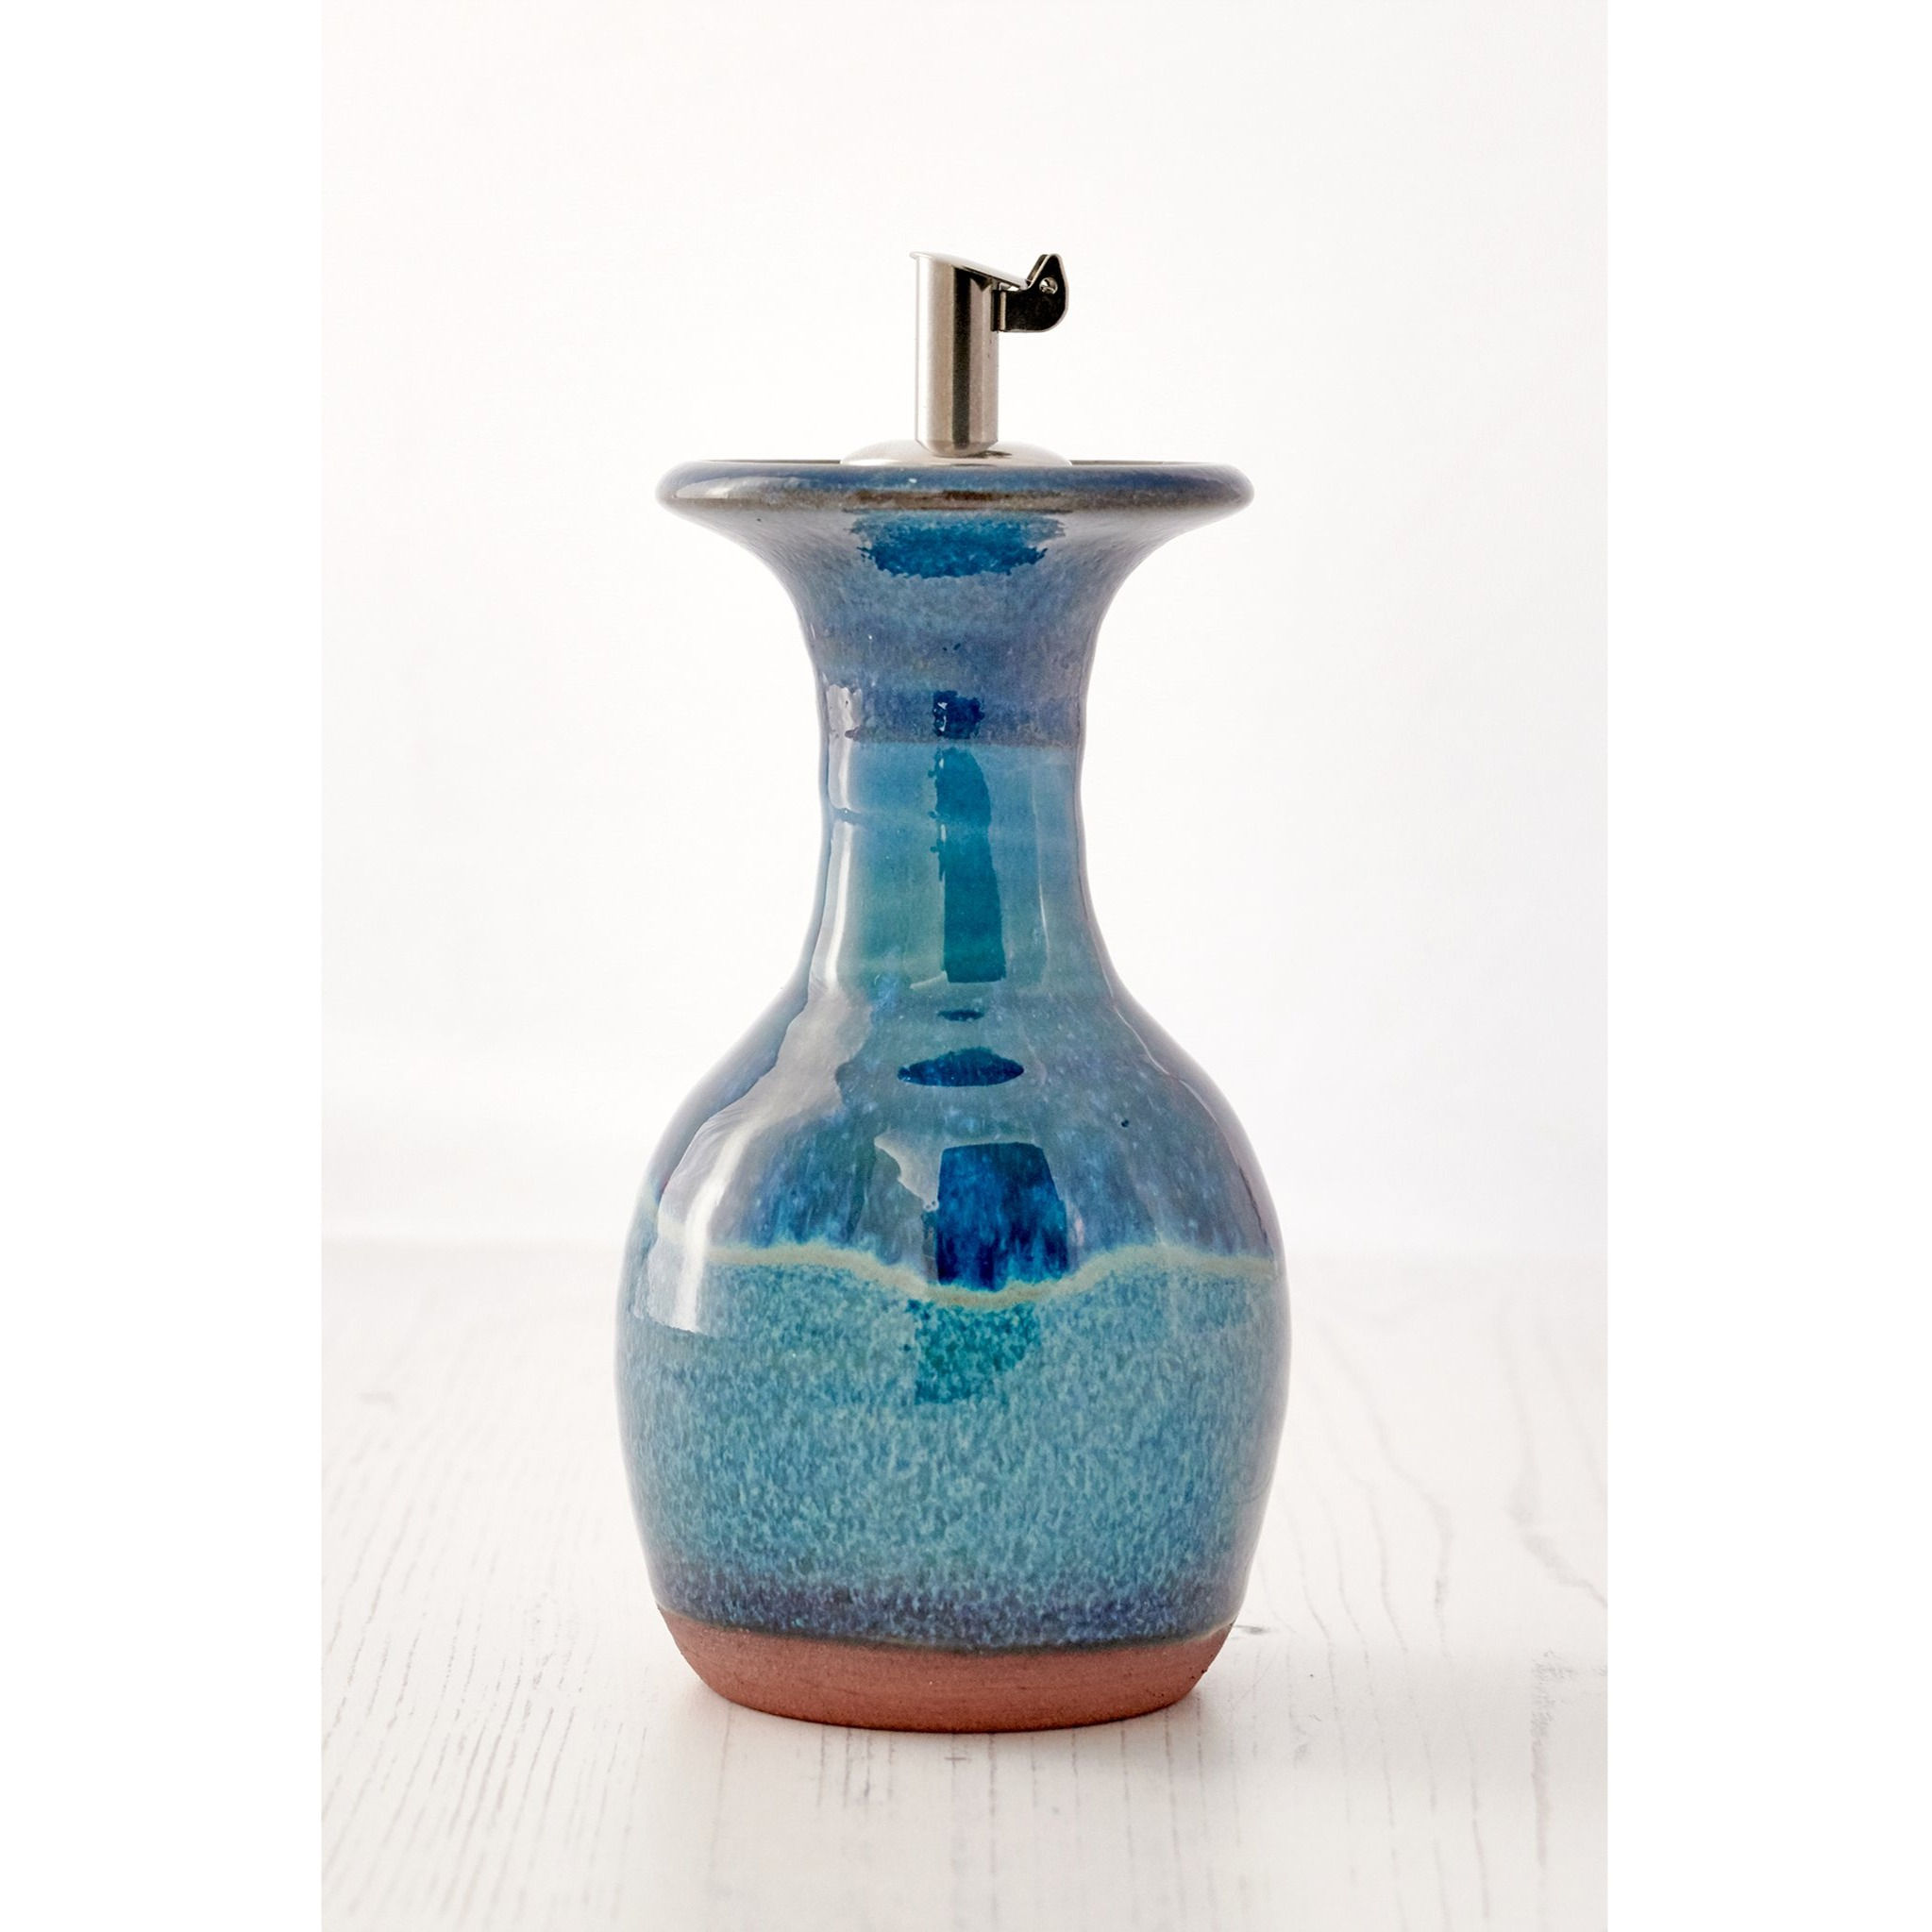 Ocean Spray Oil Decanter by Rupert Blamire